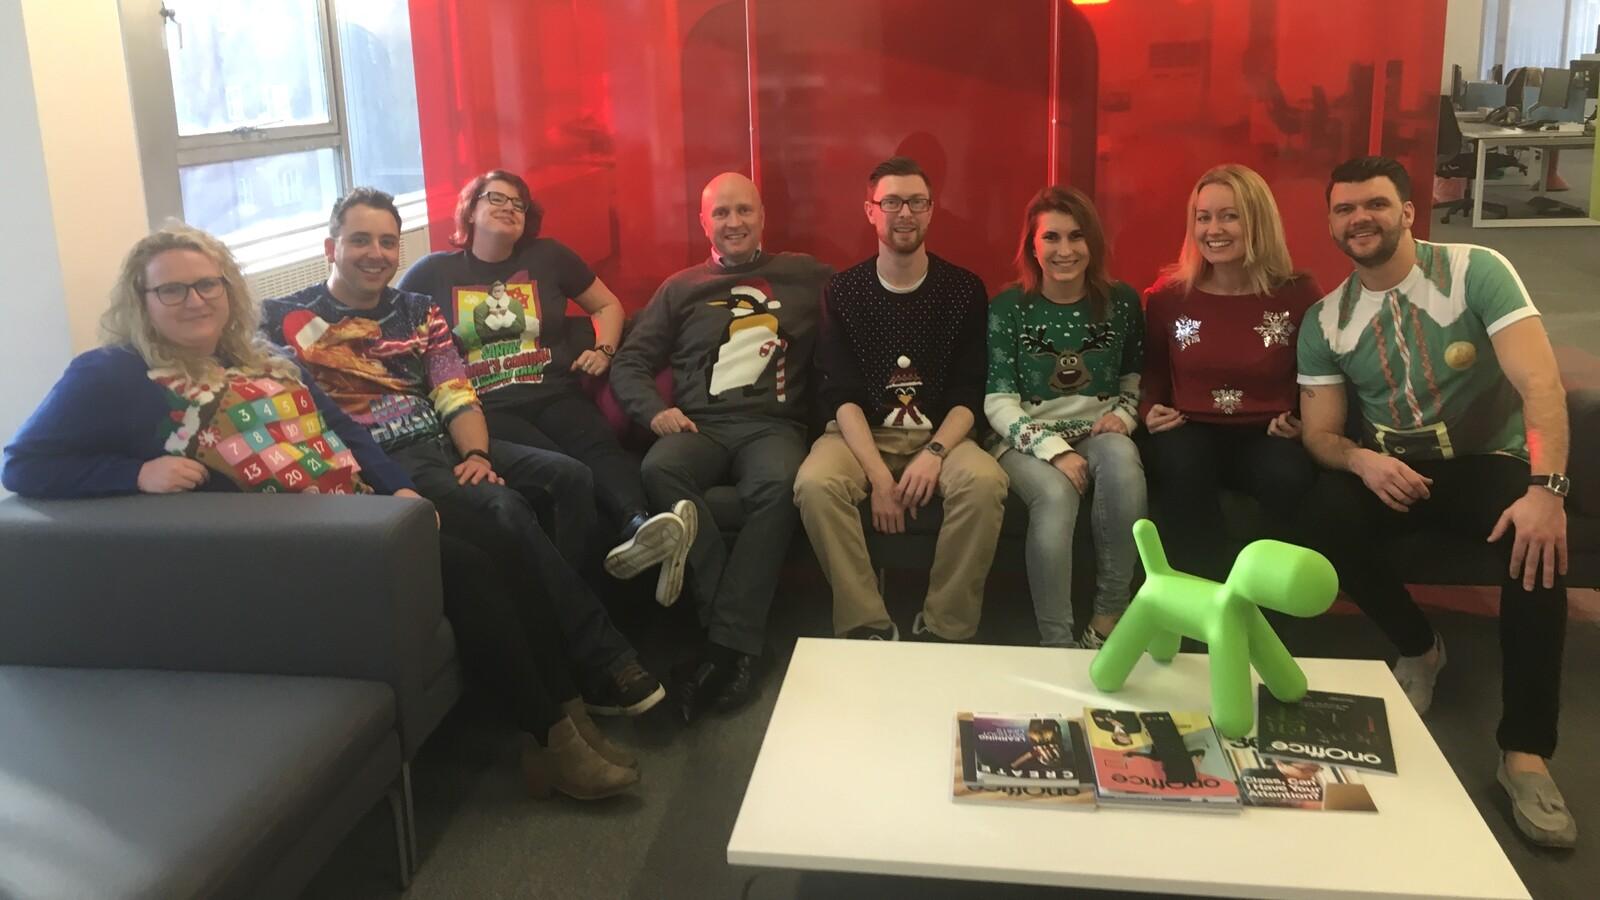 Portsdown getting in the Christmas spirit!